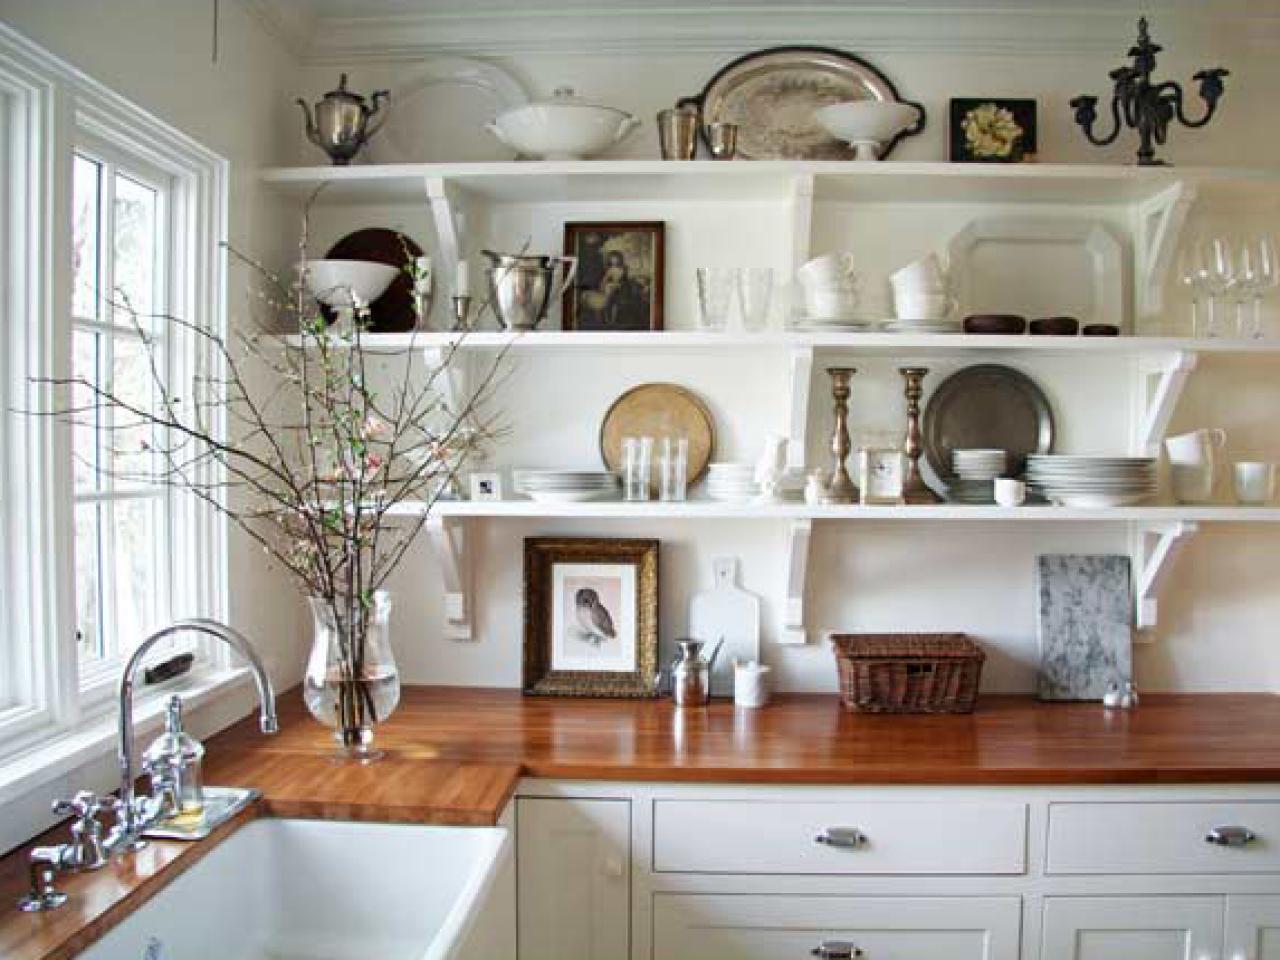 hgtv small kitchen designs photo - 1